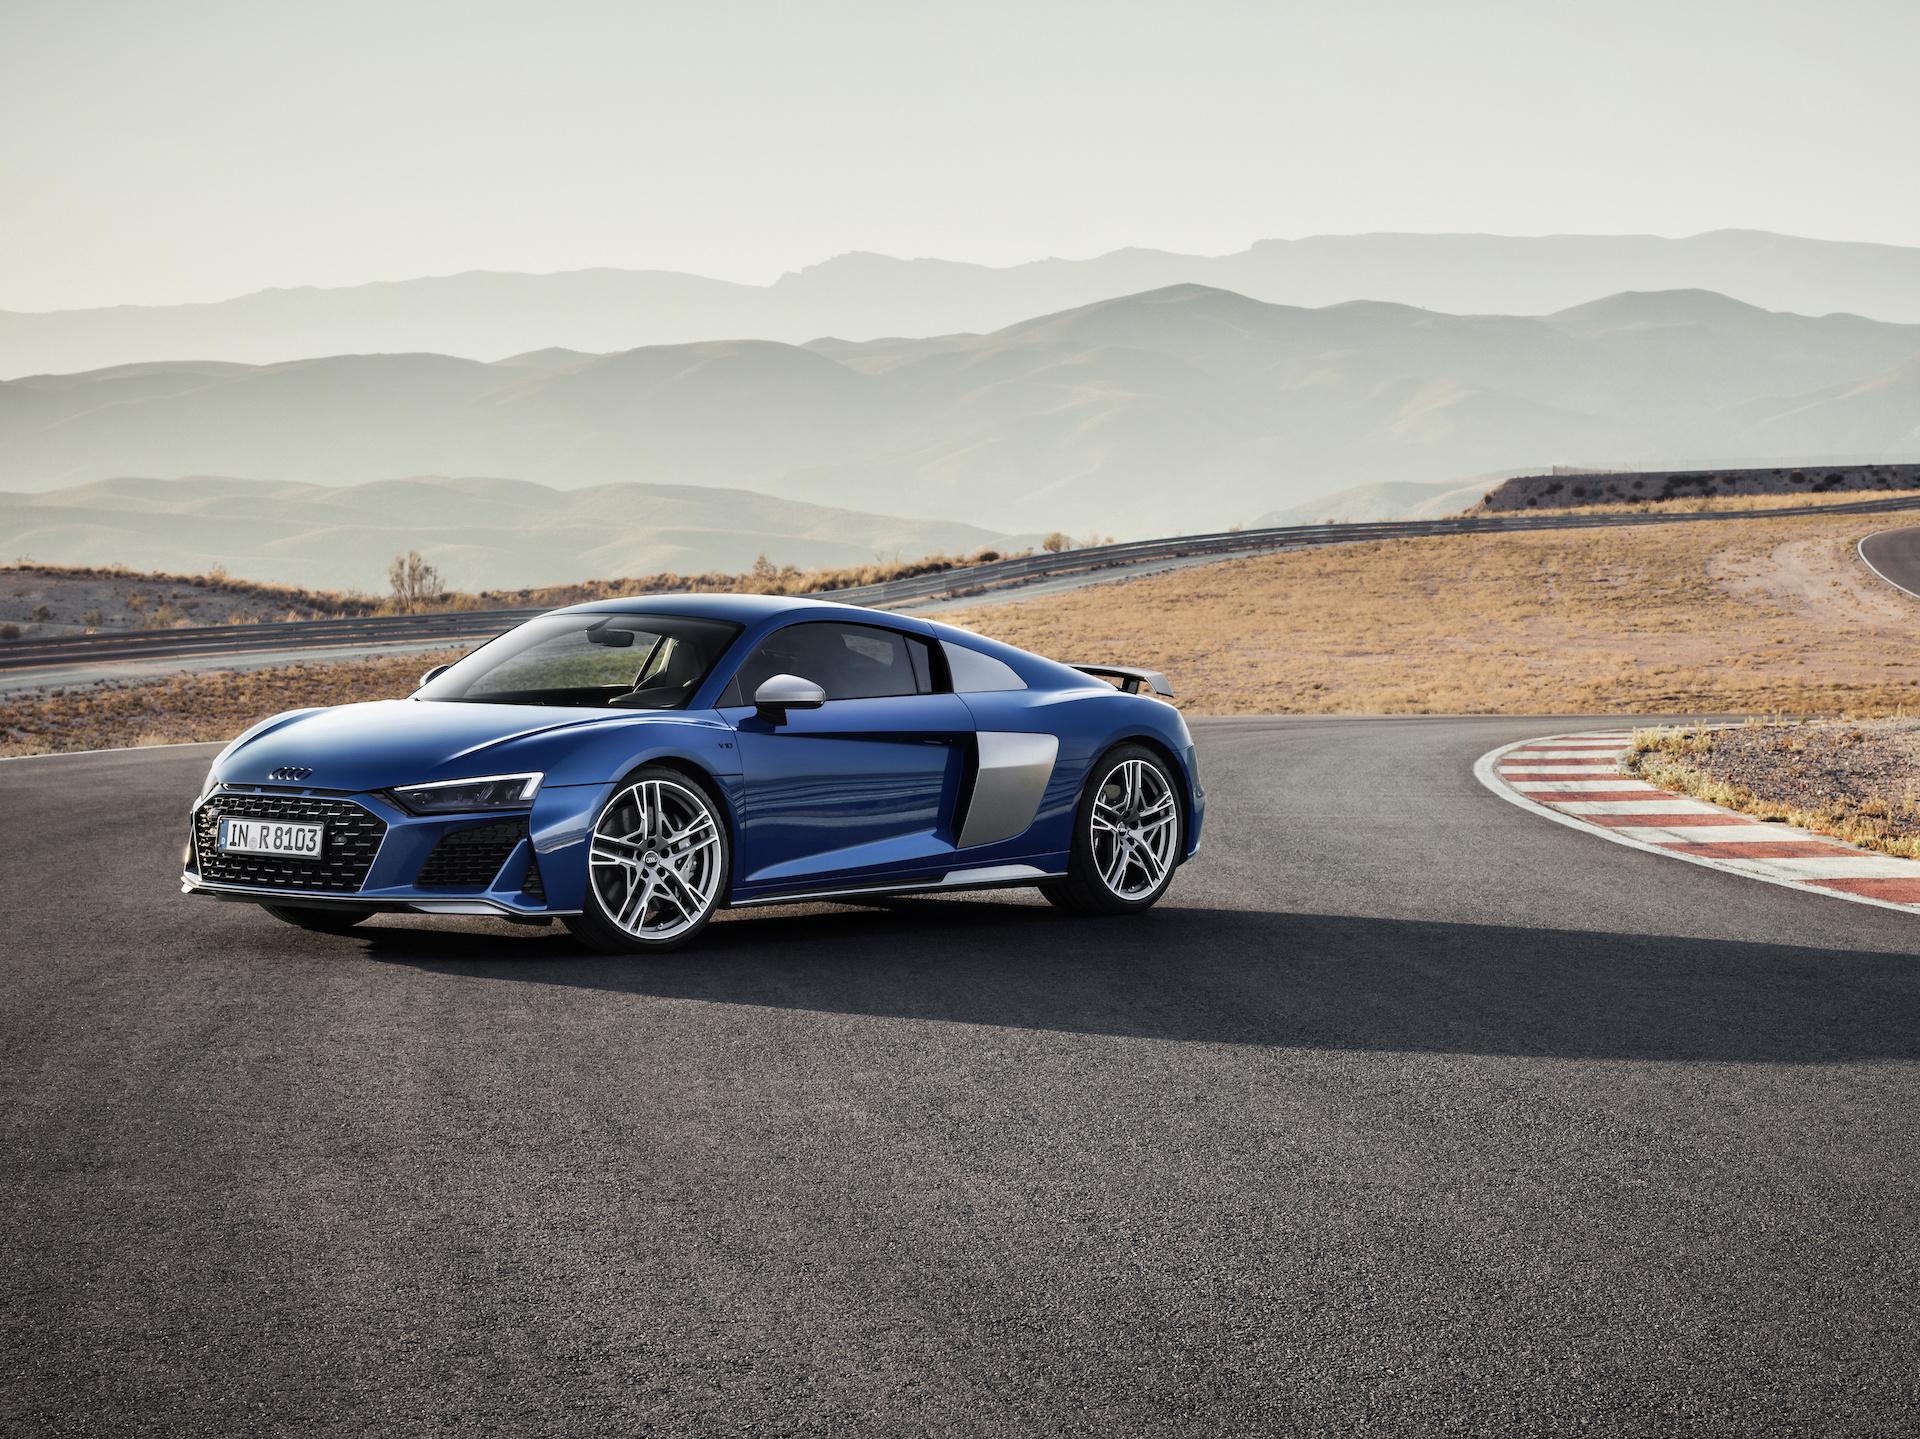 2020 Audi R8 preview